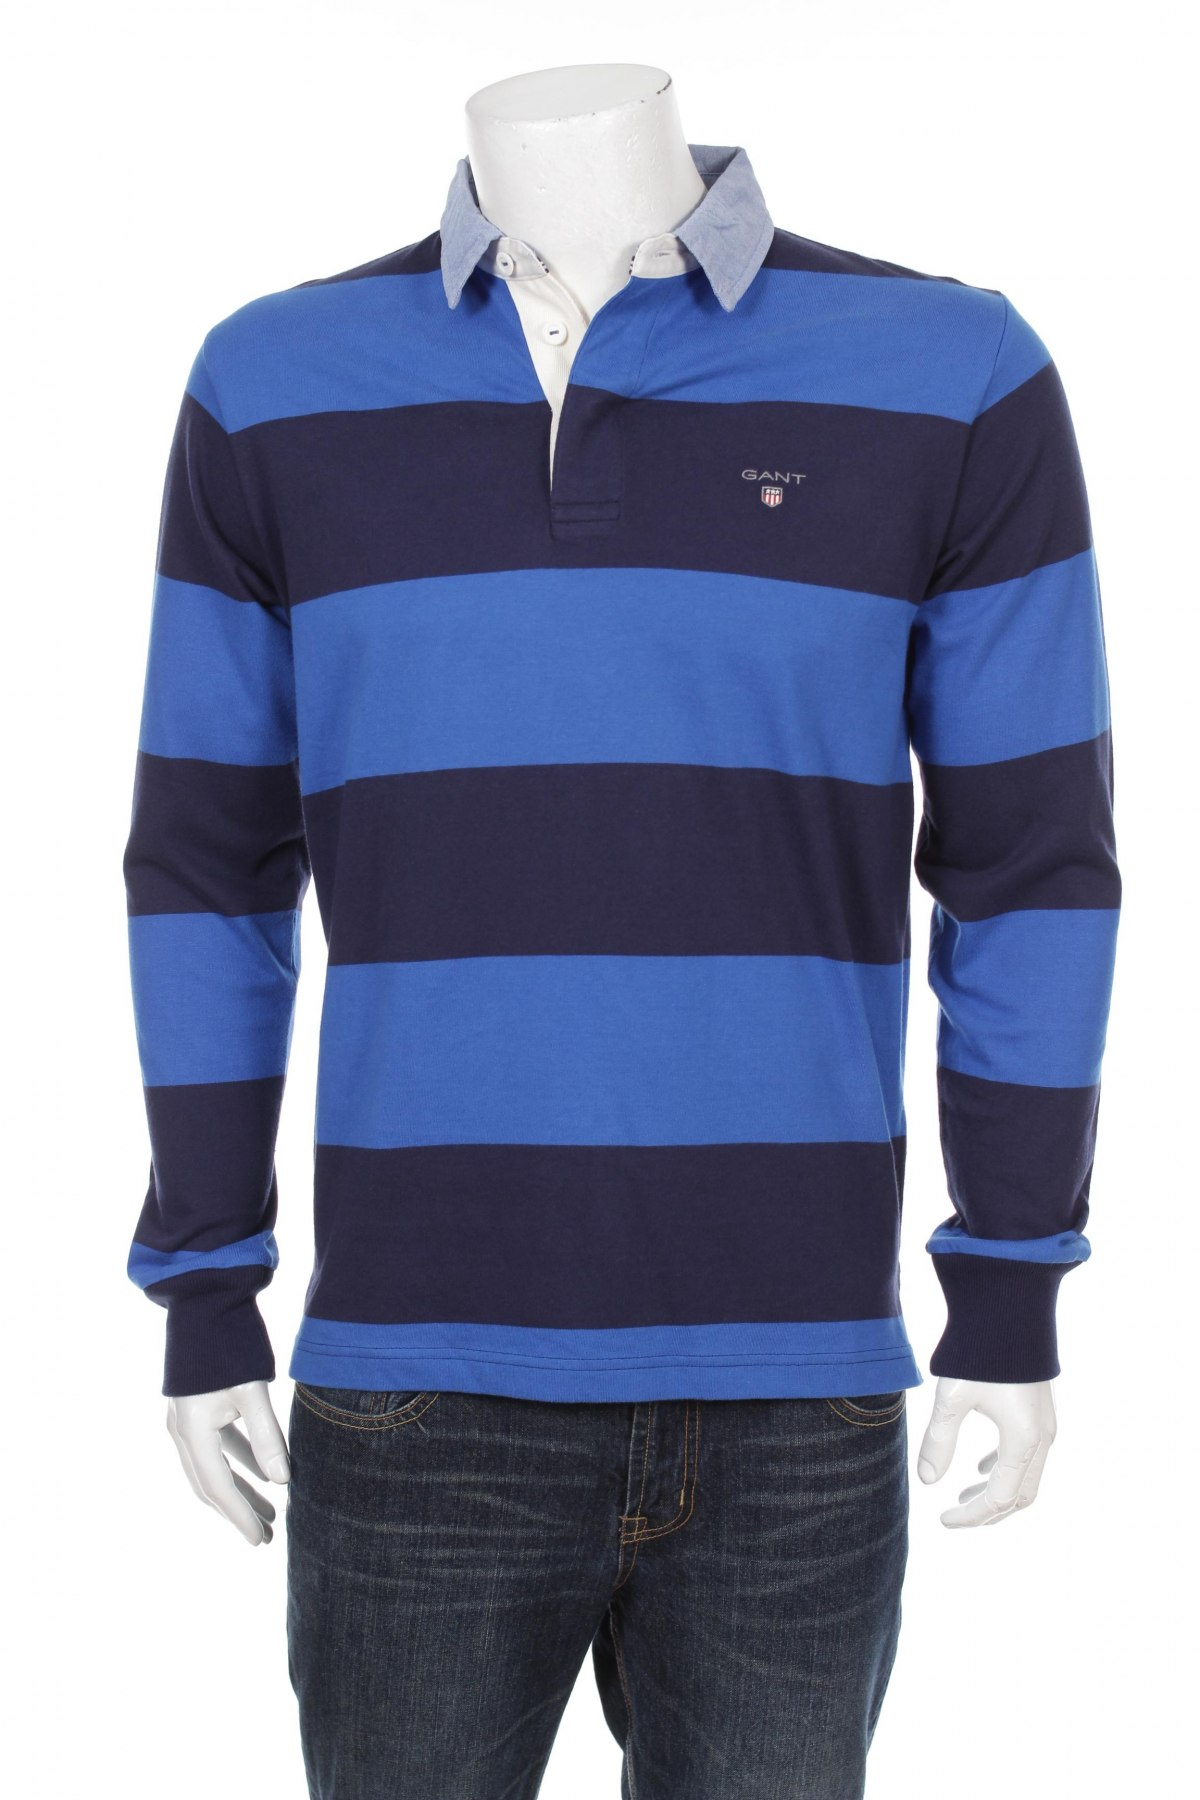 064808e06053 Ανδρική μπλούζα Gant - σε συμφέρουσα τιμή στο Remix -  101793980